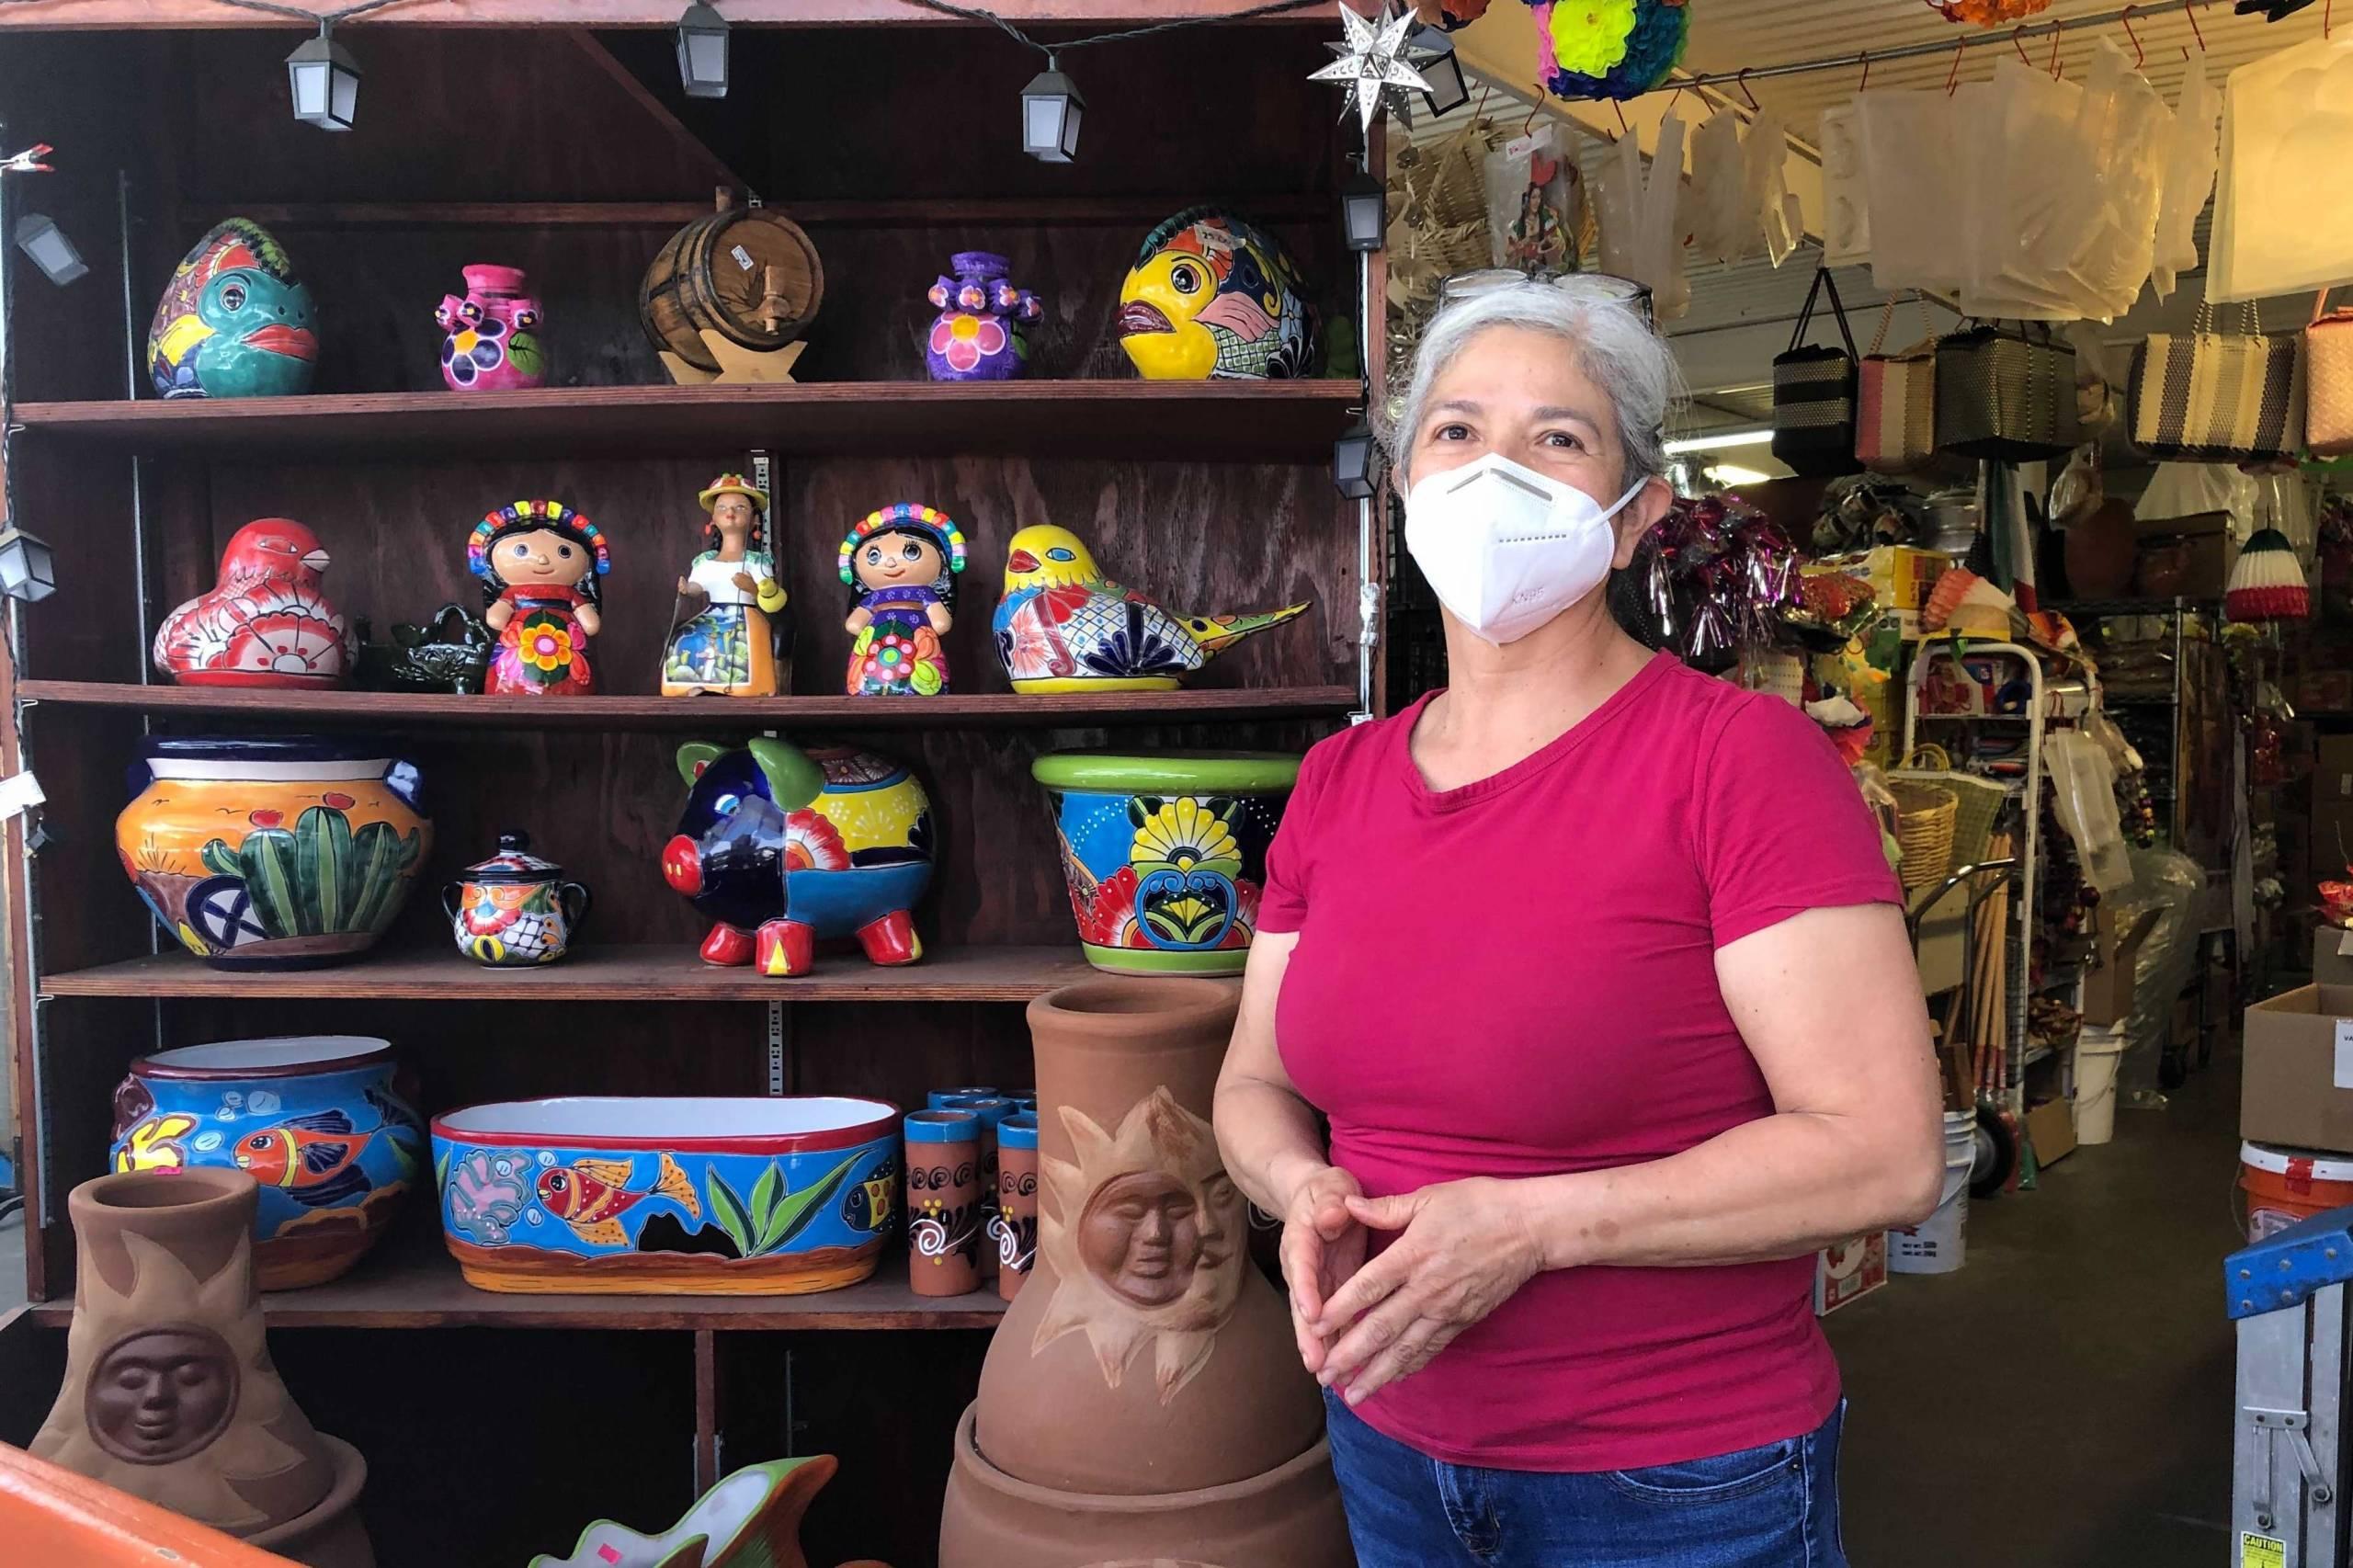 Ana Vázquez, a merchant at the San Jose Flea Market, stands next to her stall.